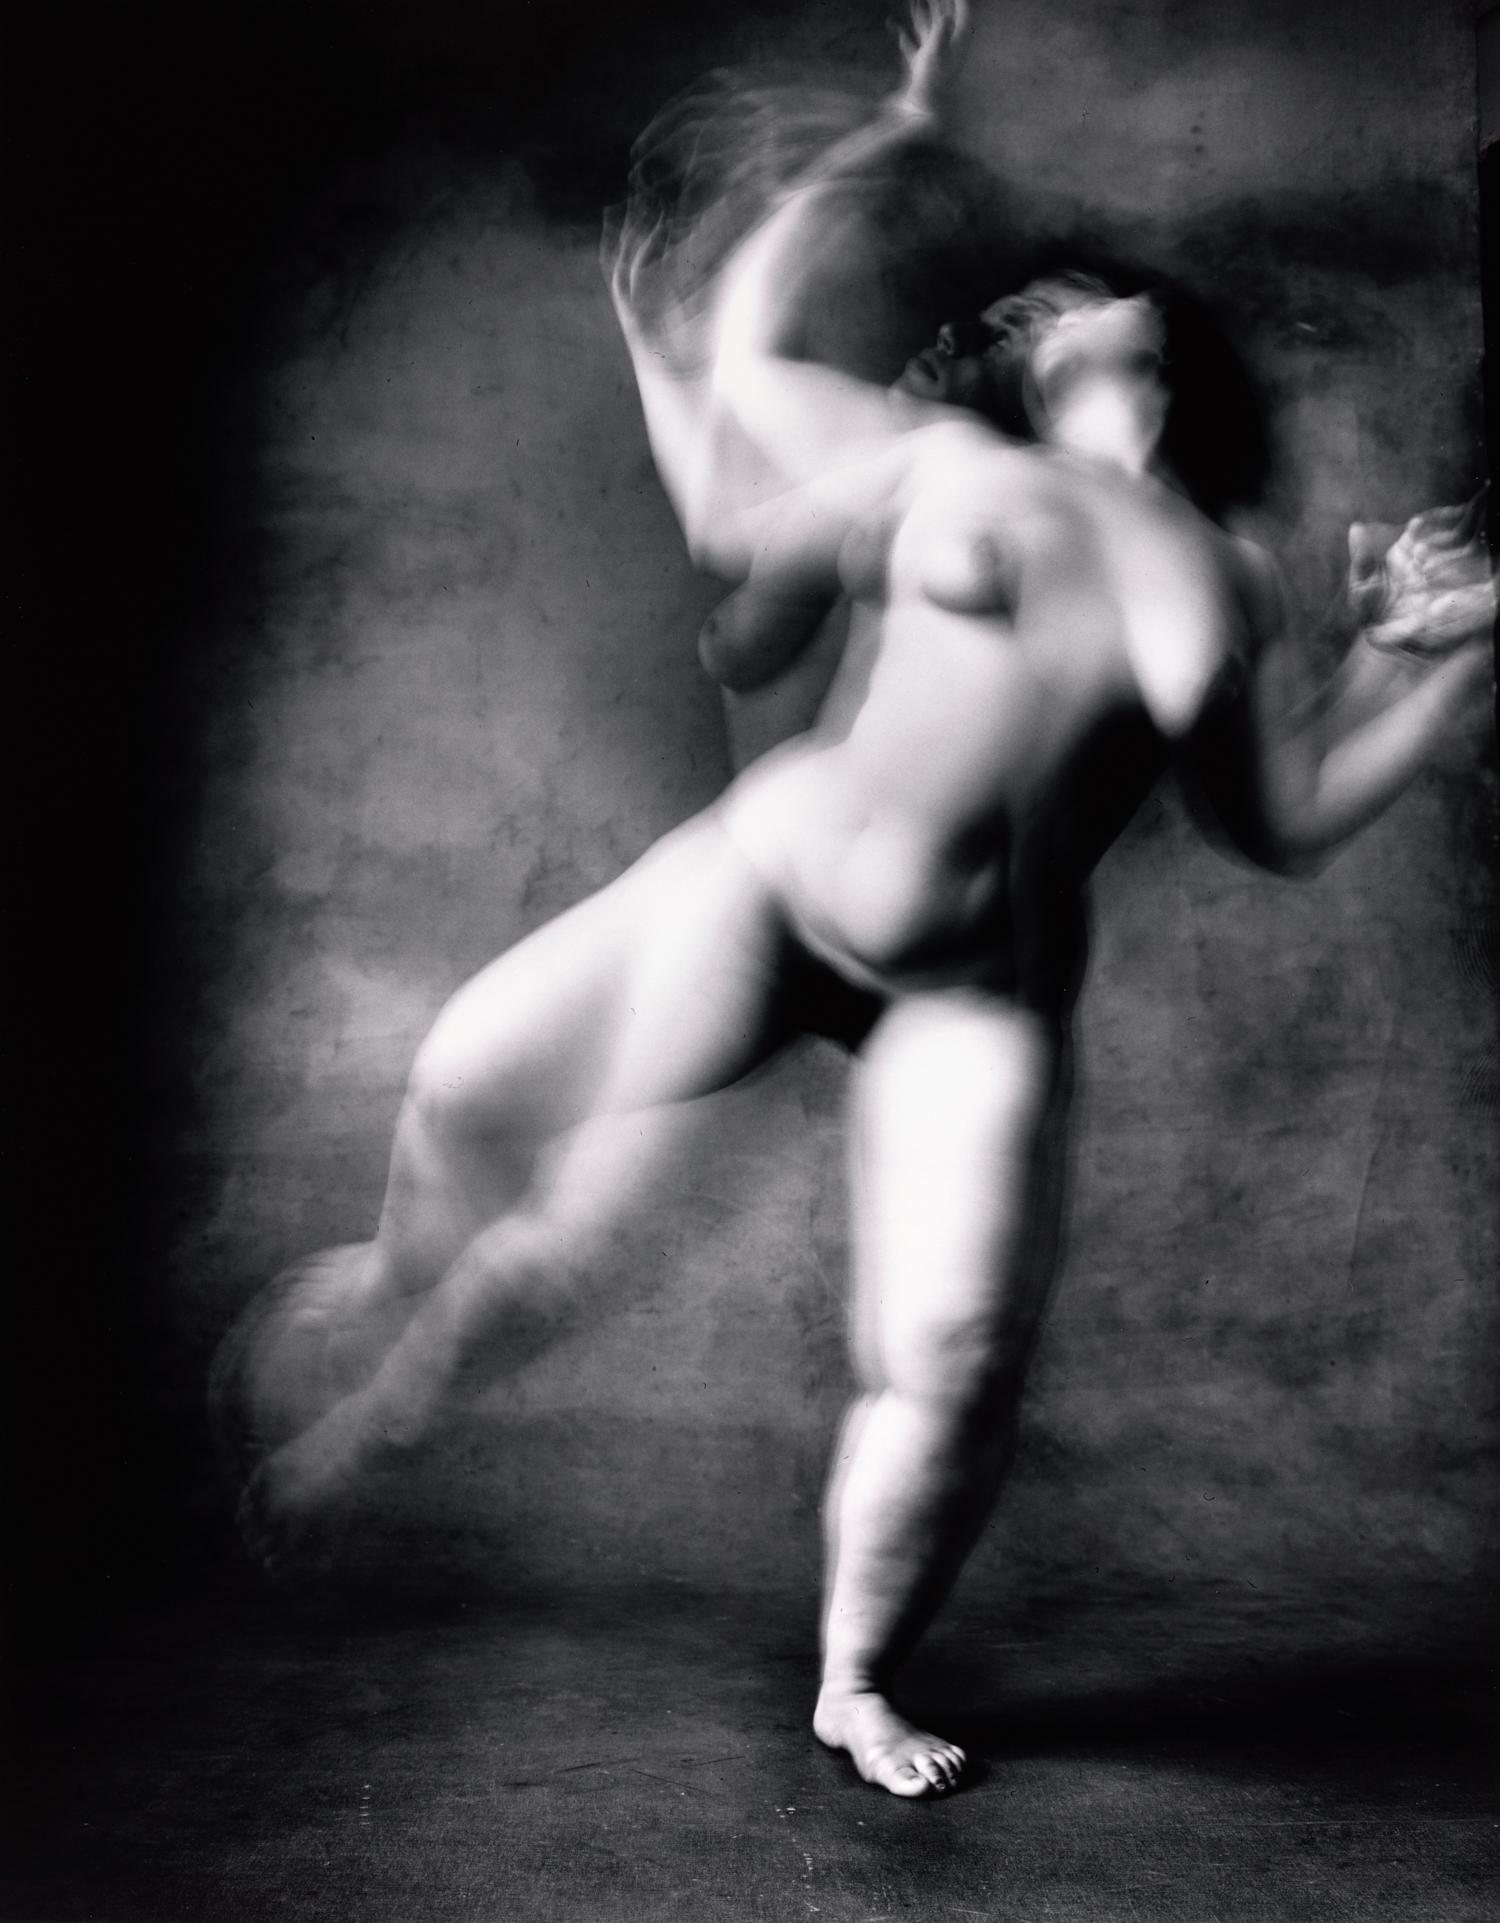 Alexandra Beller (NN) , New York, 1999 Gelatin silver print © The Irving Penn Foundation